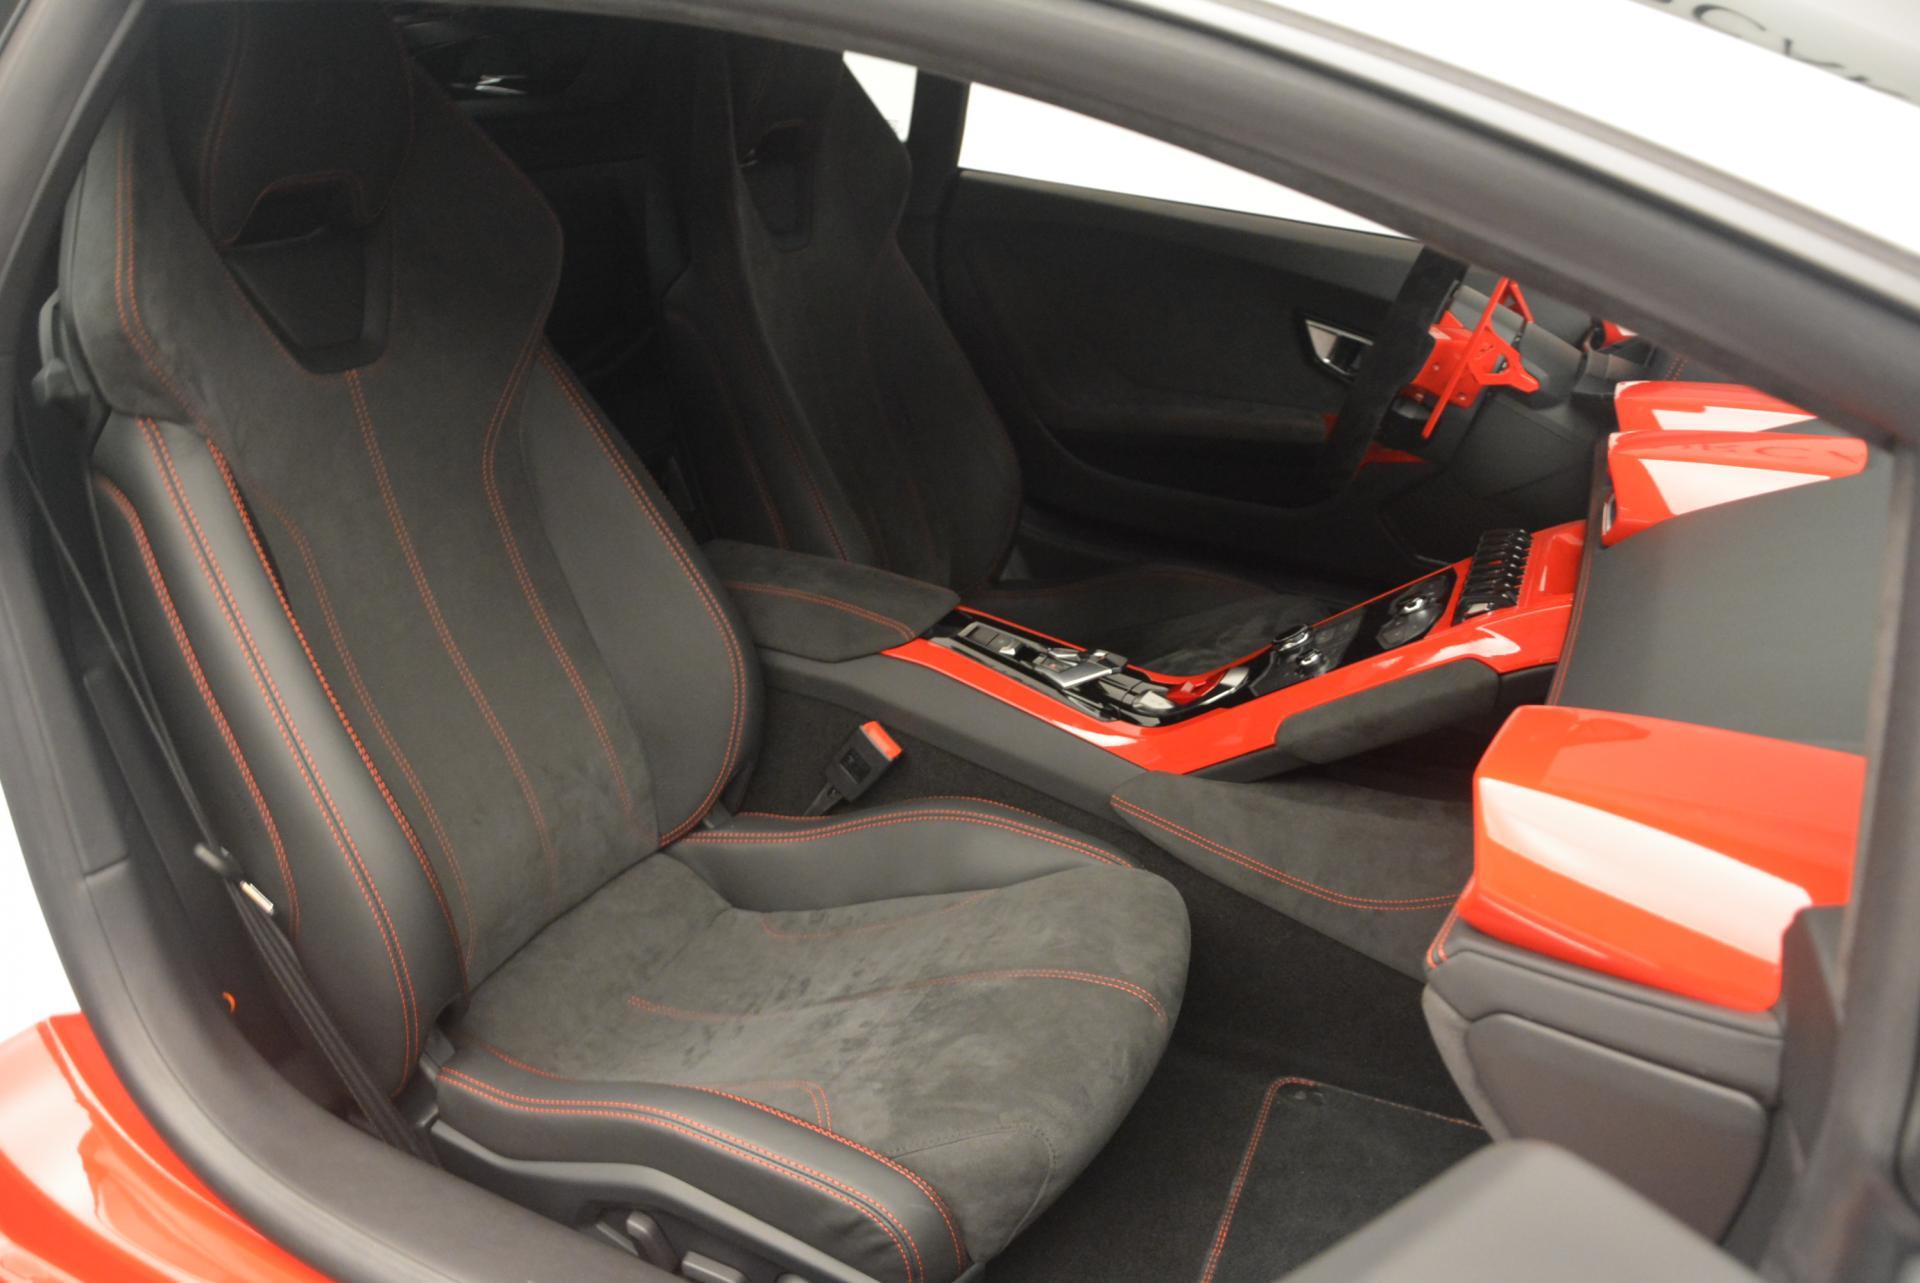 Used 2015 Lamborghini Huracan LP610-4 For Sale In Greenwich, CT. Alfa Romeo of Greenwich, F1707A 114_p18